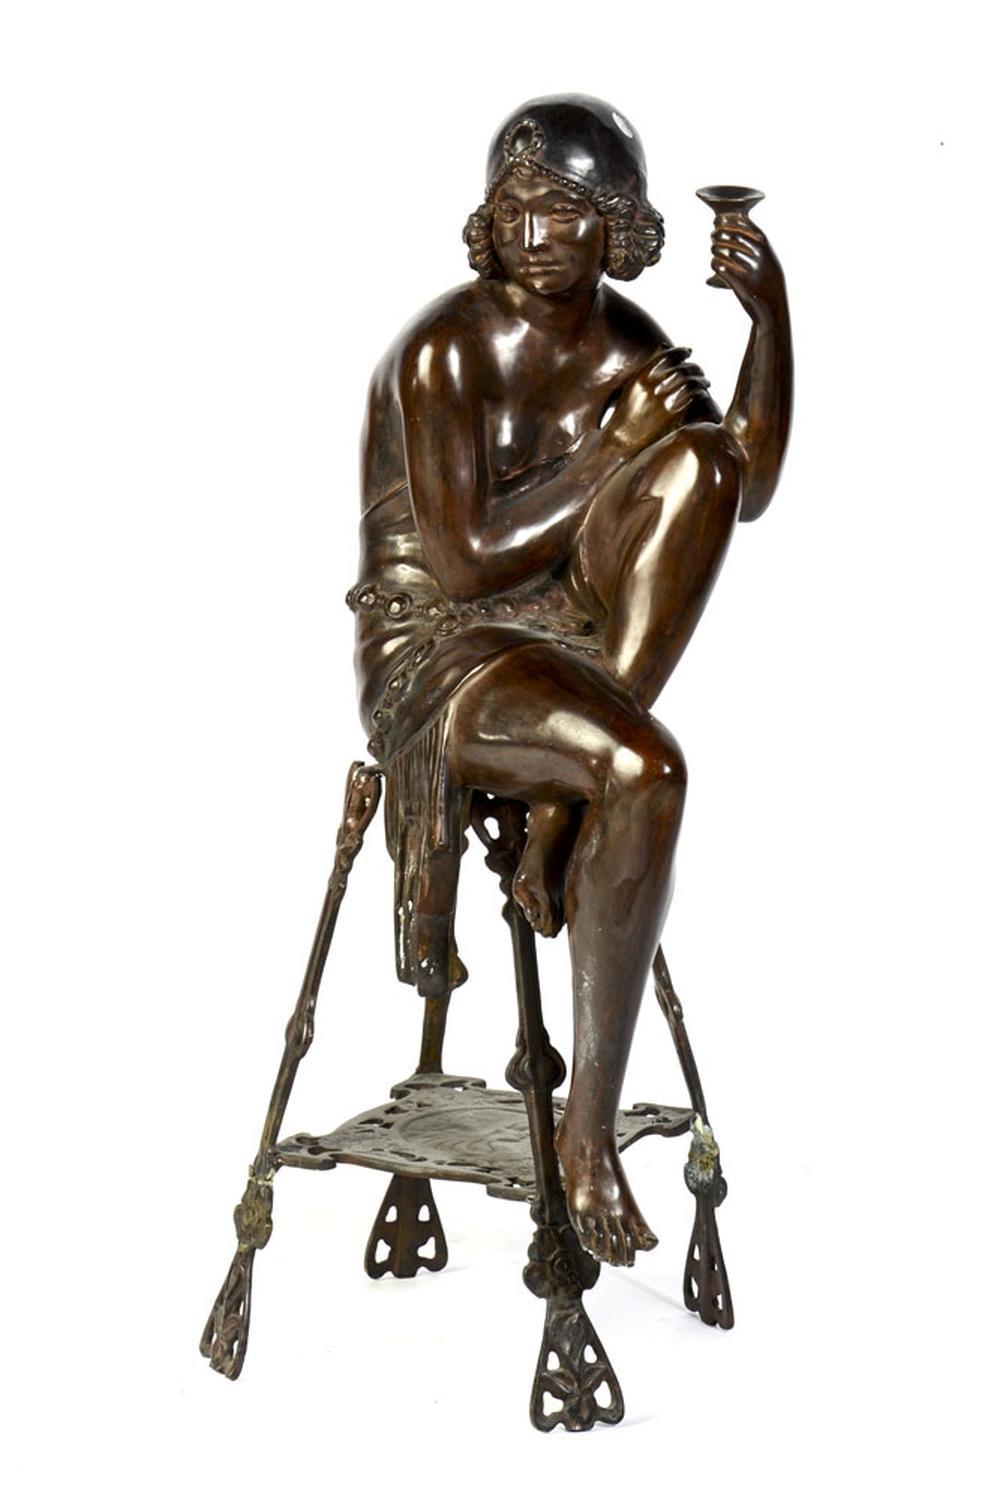 Figura feminina, Escultura em bronze, 78 cm.